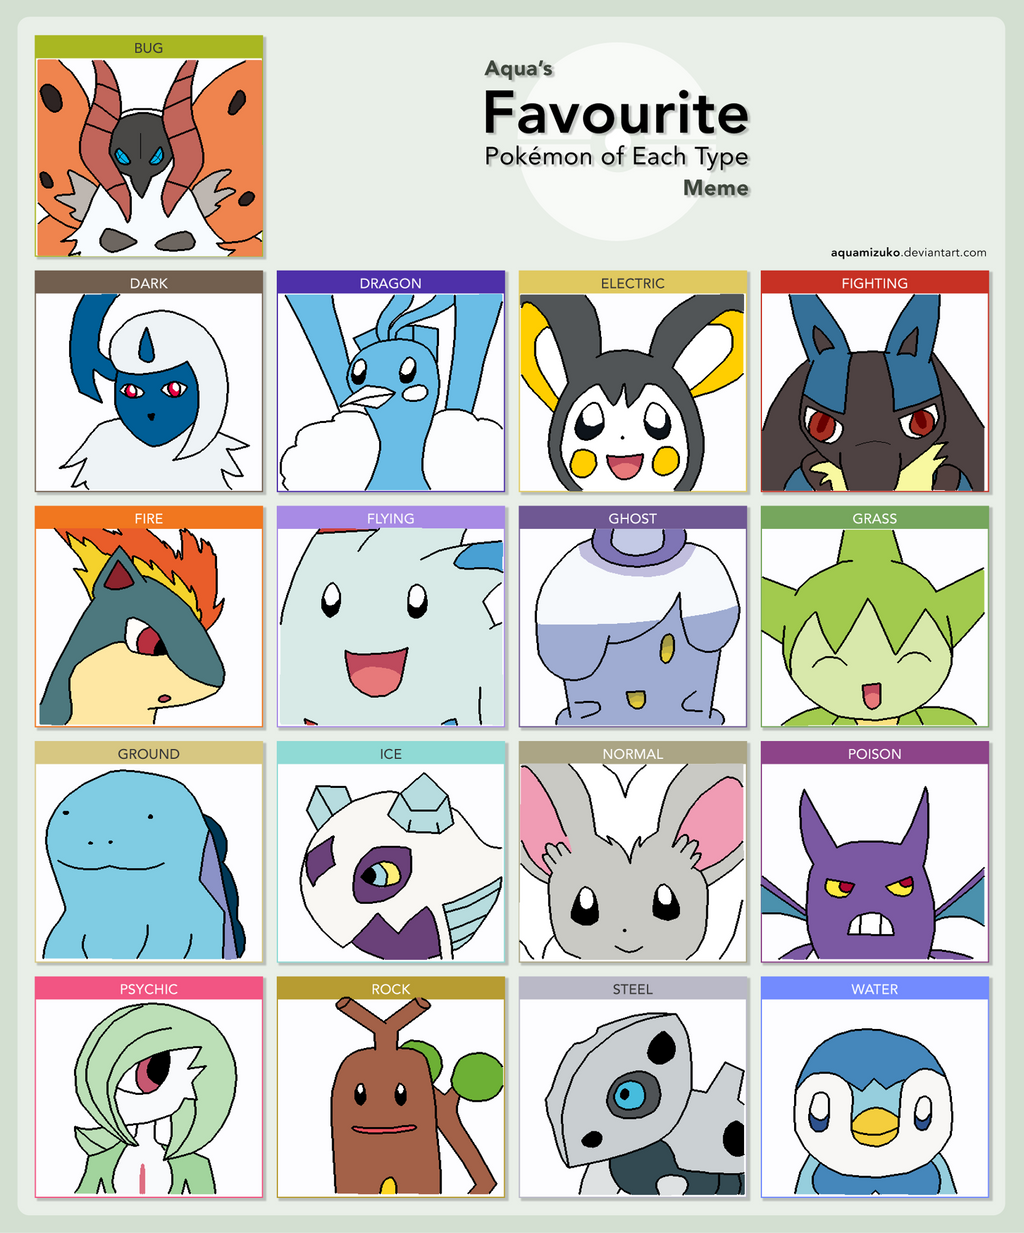 Aqua's Pokemon Meme by 4themindandsoul